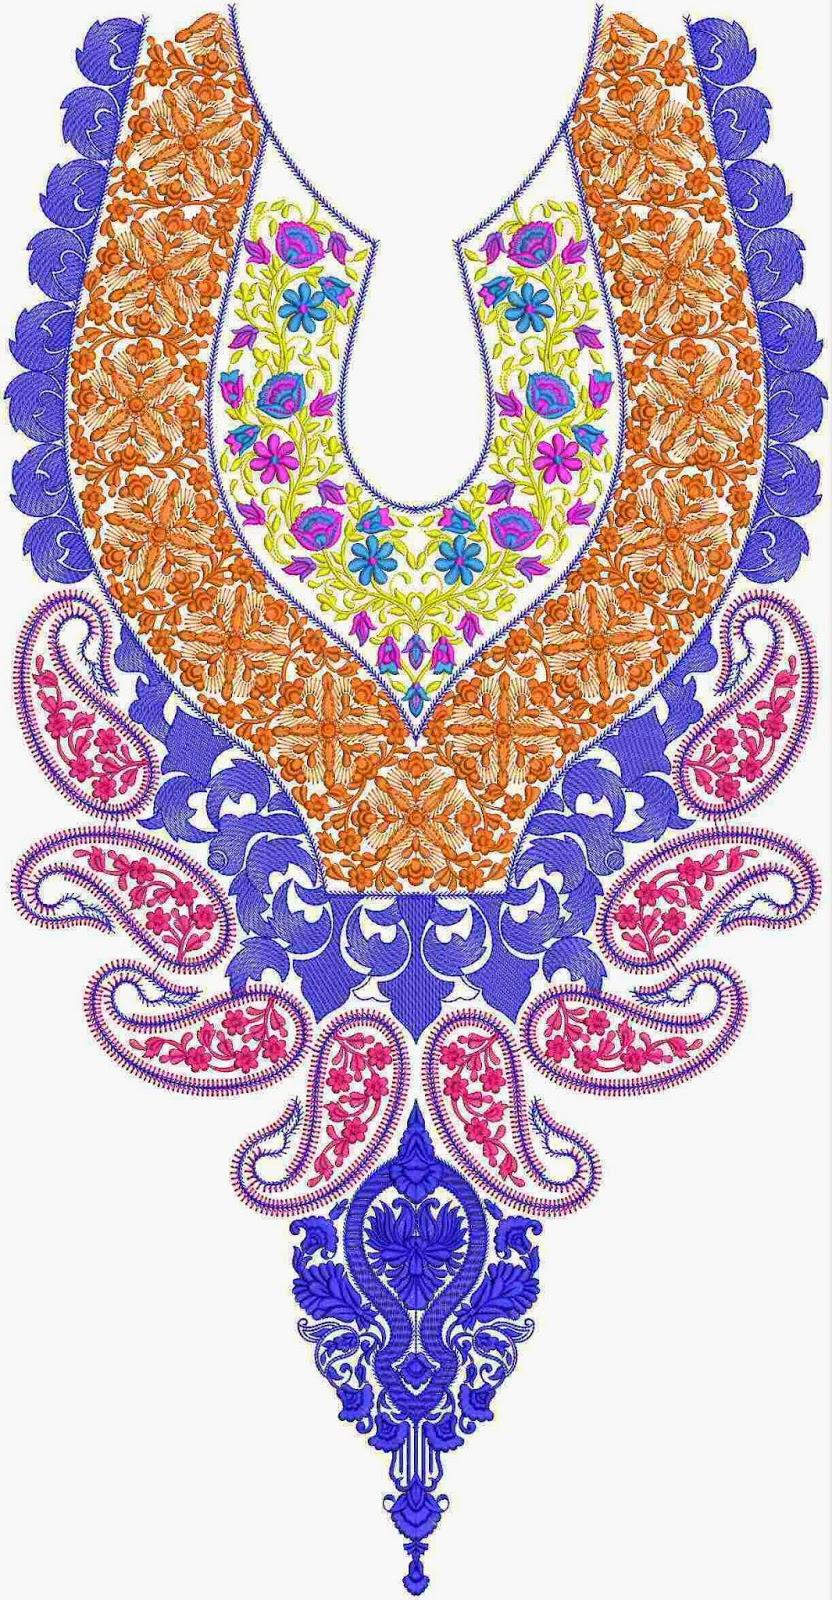 Embdesigntube: Nice Neck Embroidery Designs